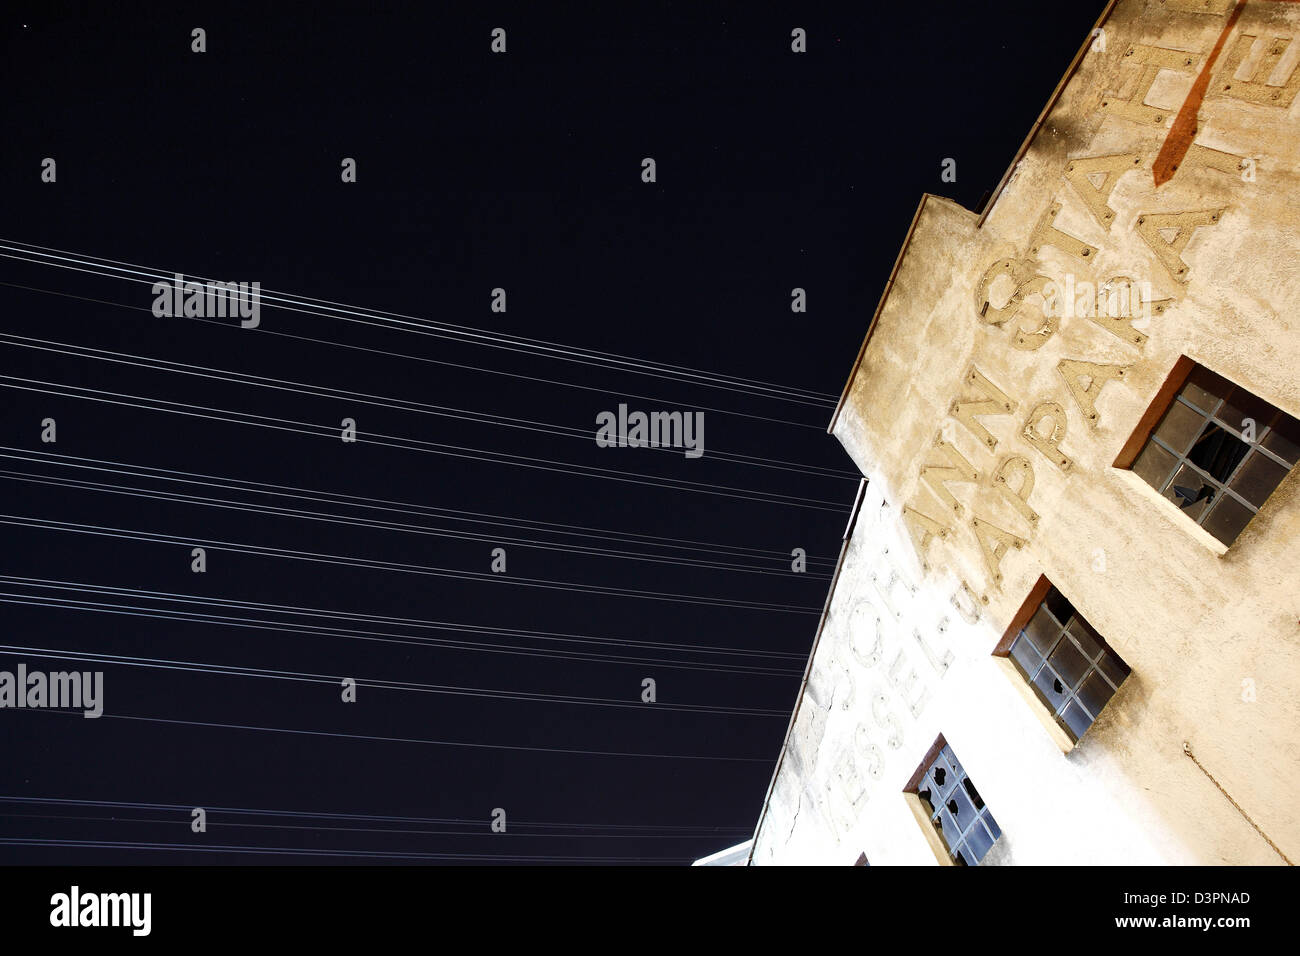 Apparatebau Stockfotos & Apparatebau Bilder - Alamy